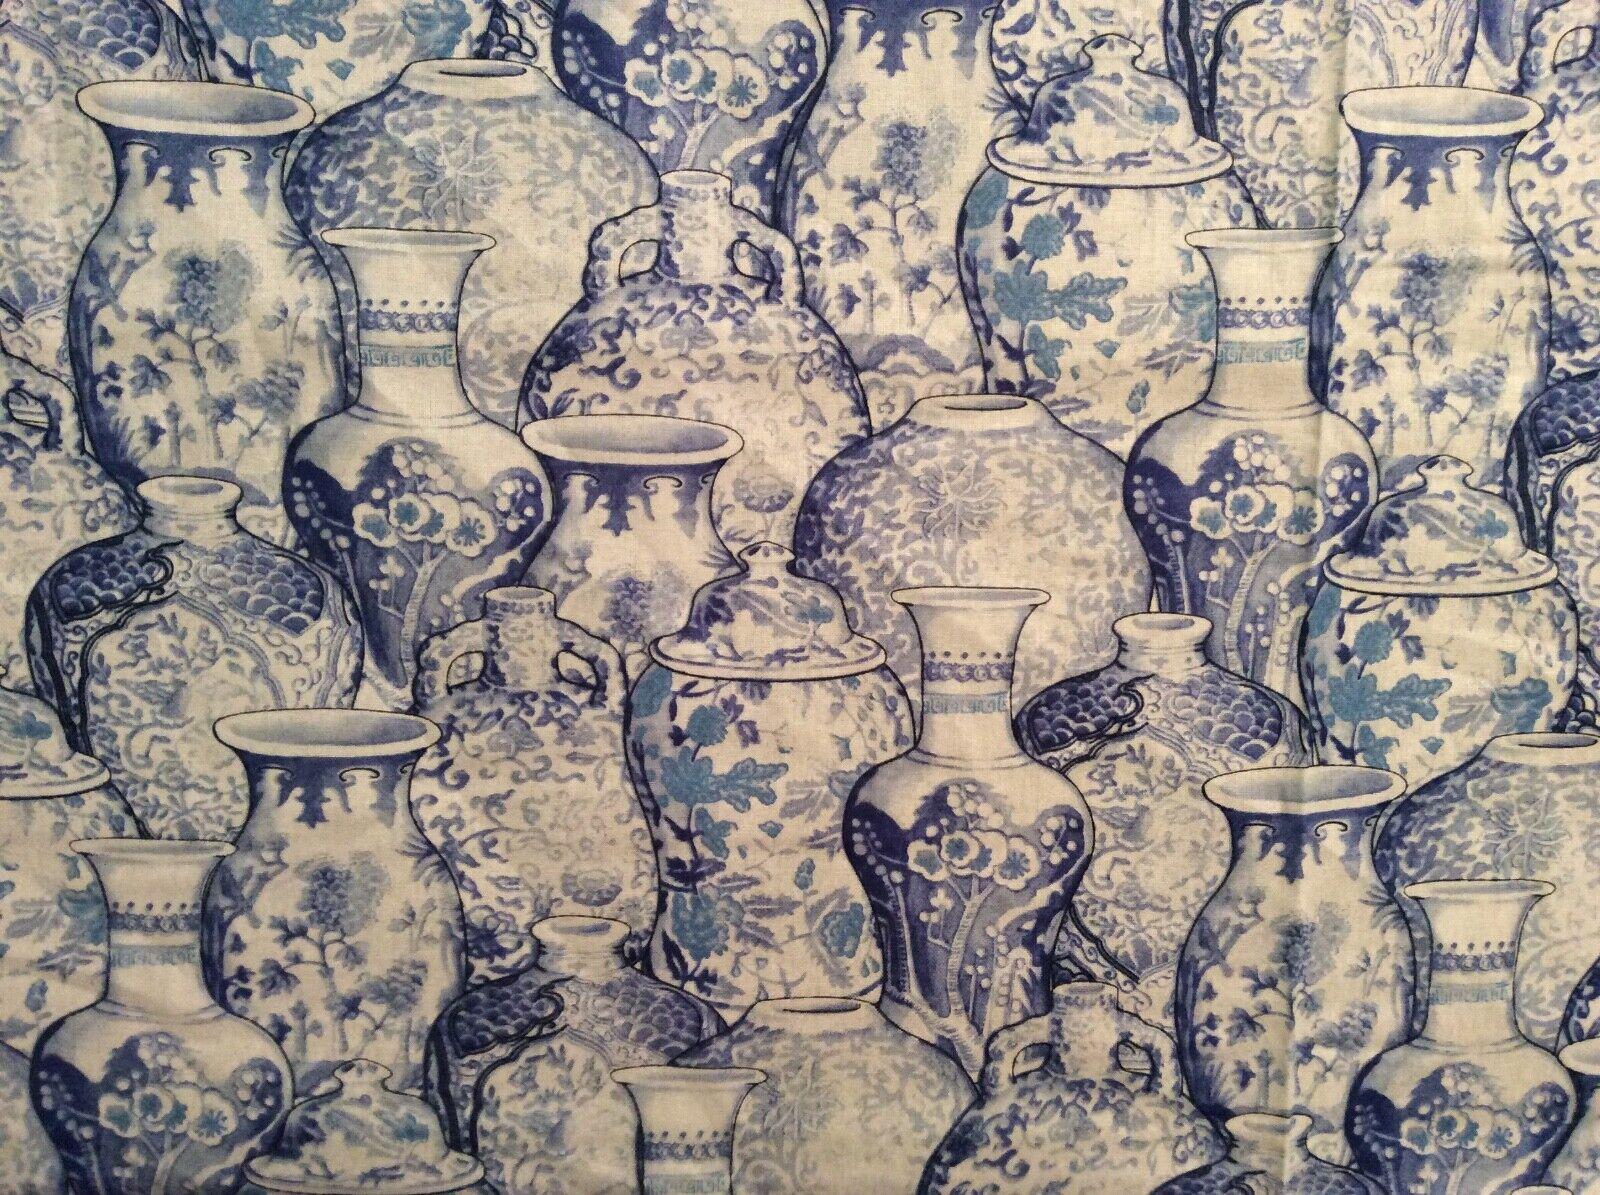 Peacock Arbor Ginger Jar China Porcelain Vase 100% Cotton Fa